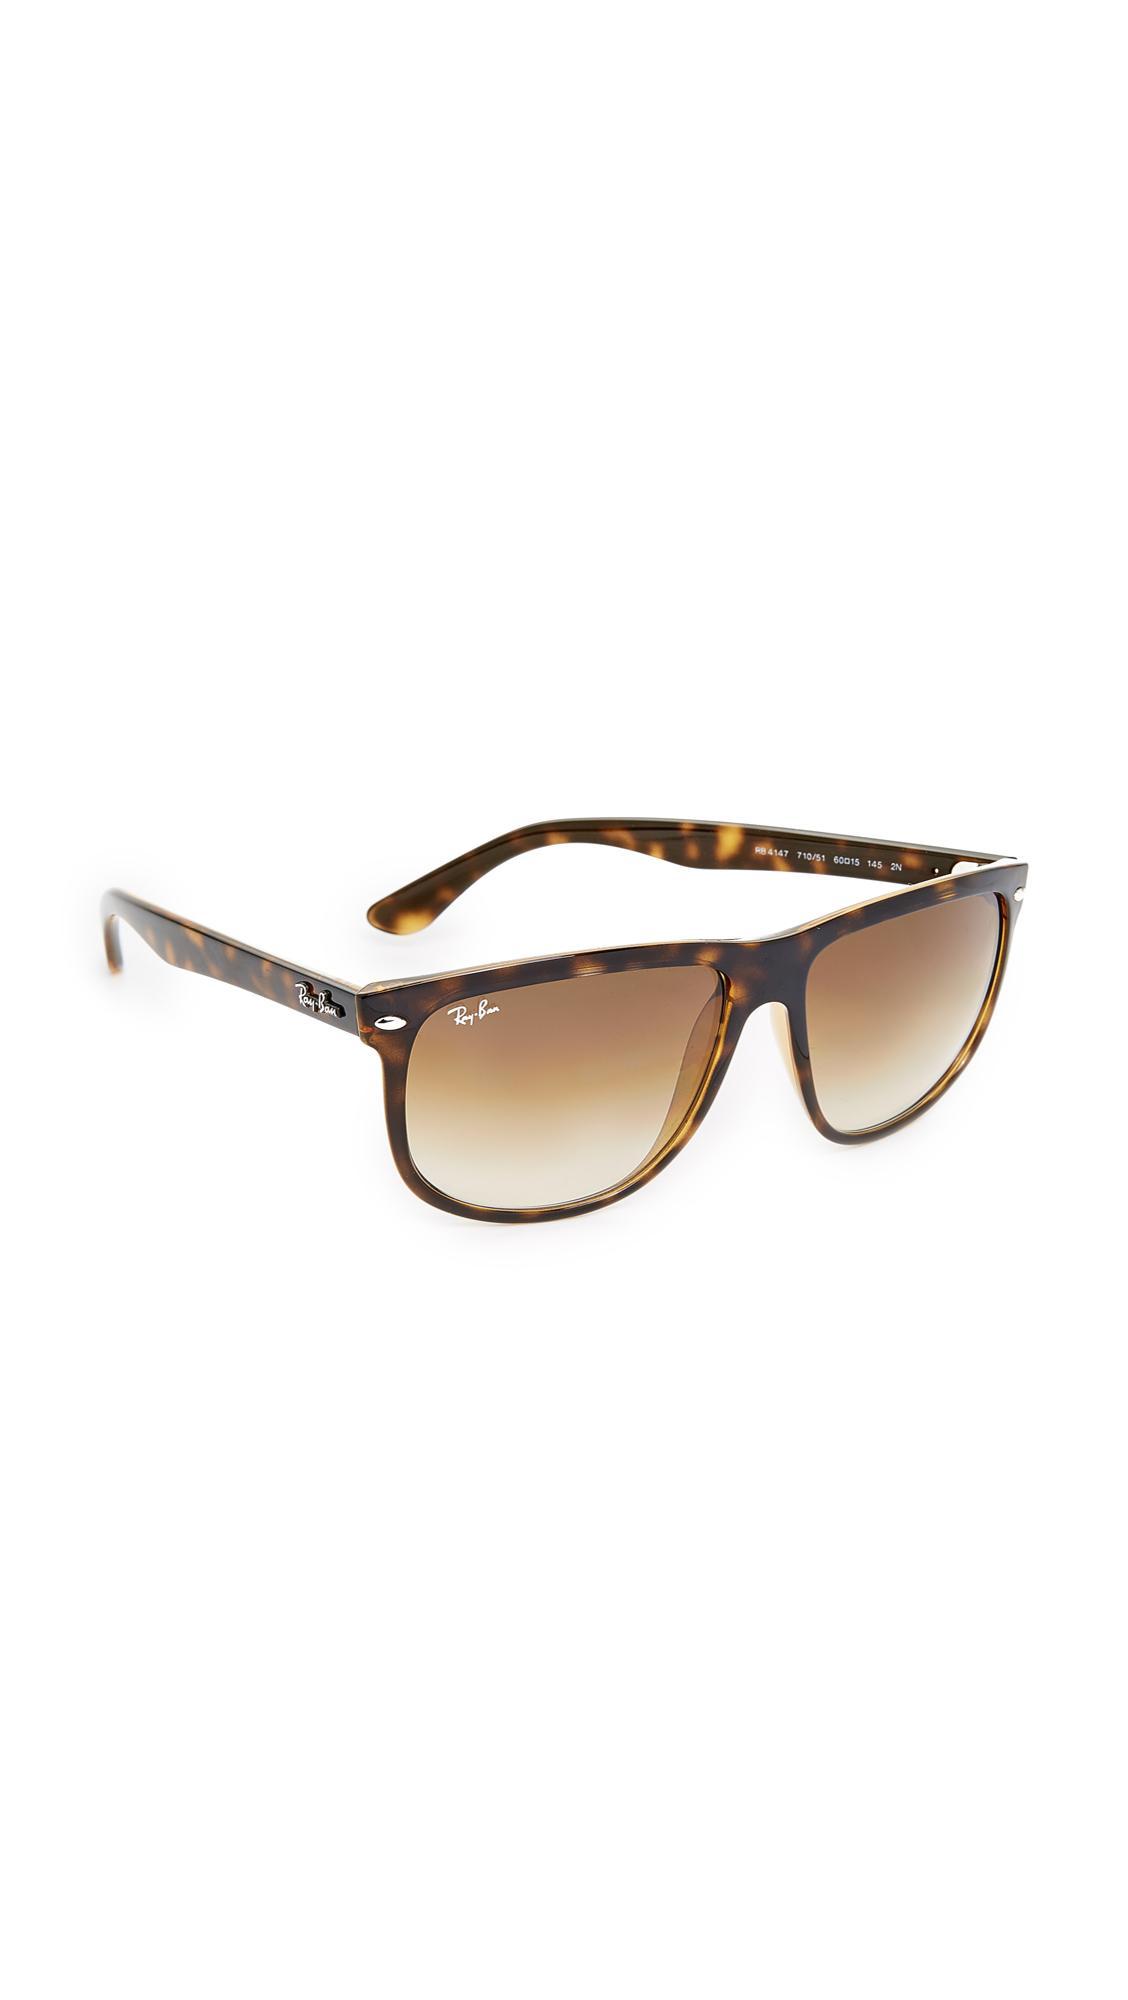 1f551c8fcc6 Ray Ban Light Havana Sunglasses Flat Boyfriend Jeans « Heritage Malta